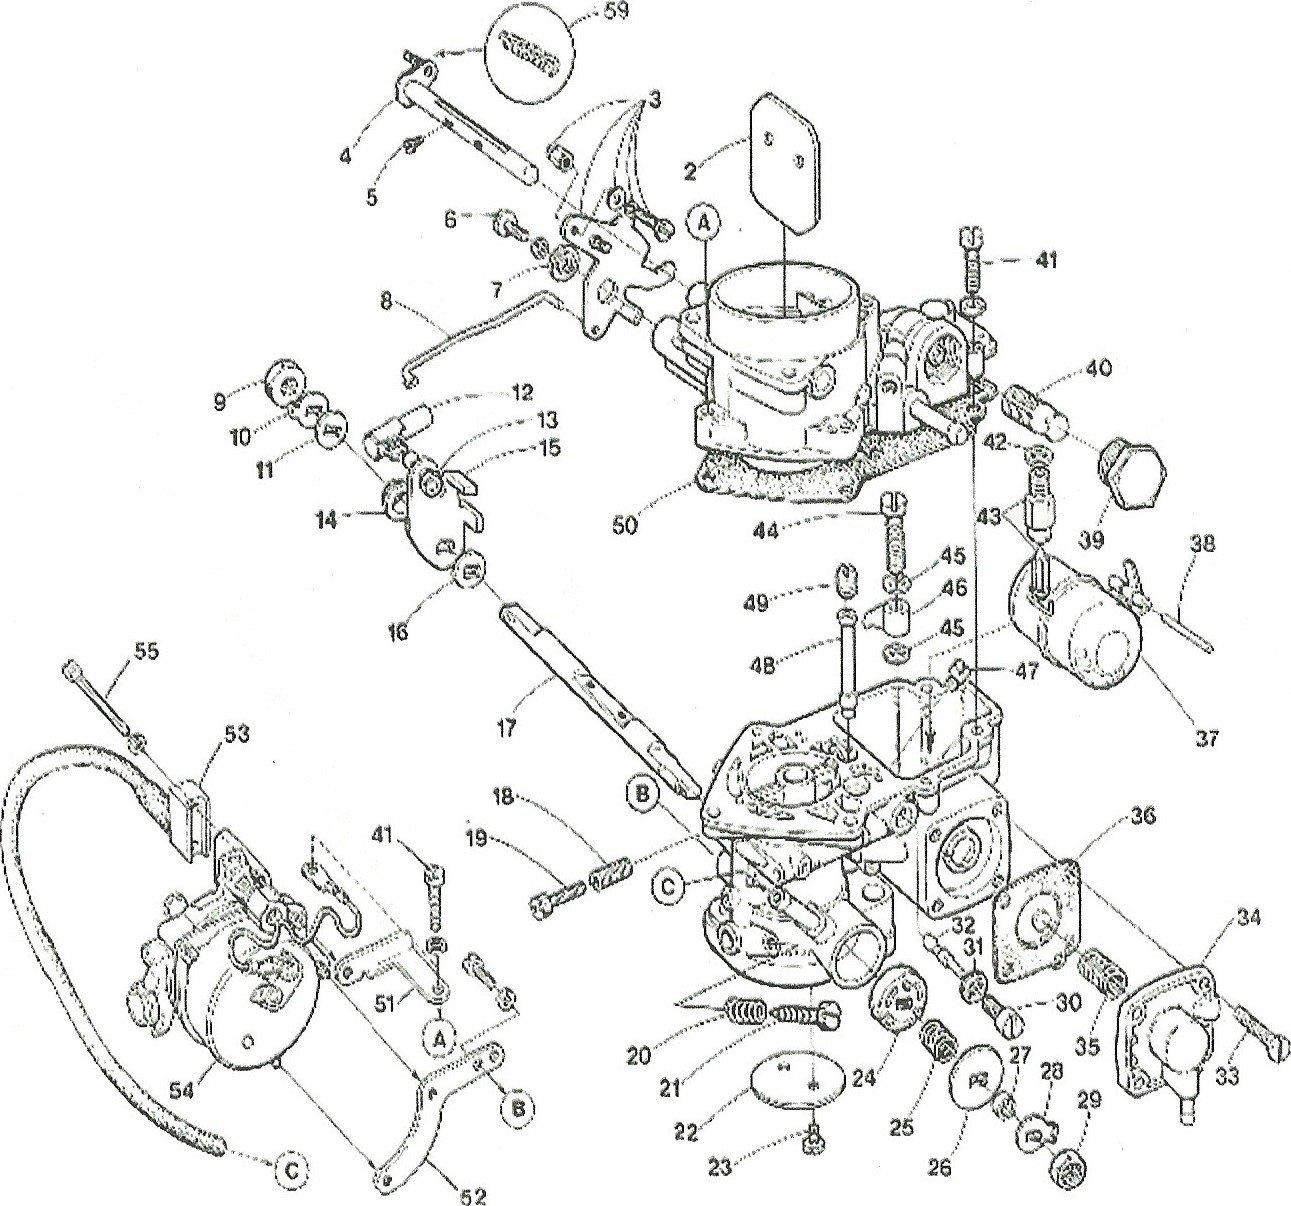 Westerbeke Wiring Diagram Get Free Image About Wiring Diagram